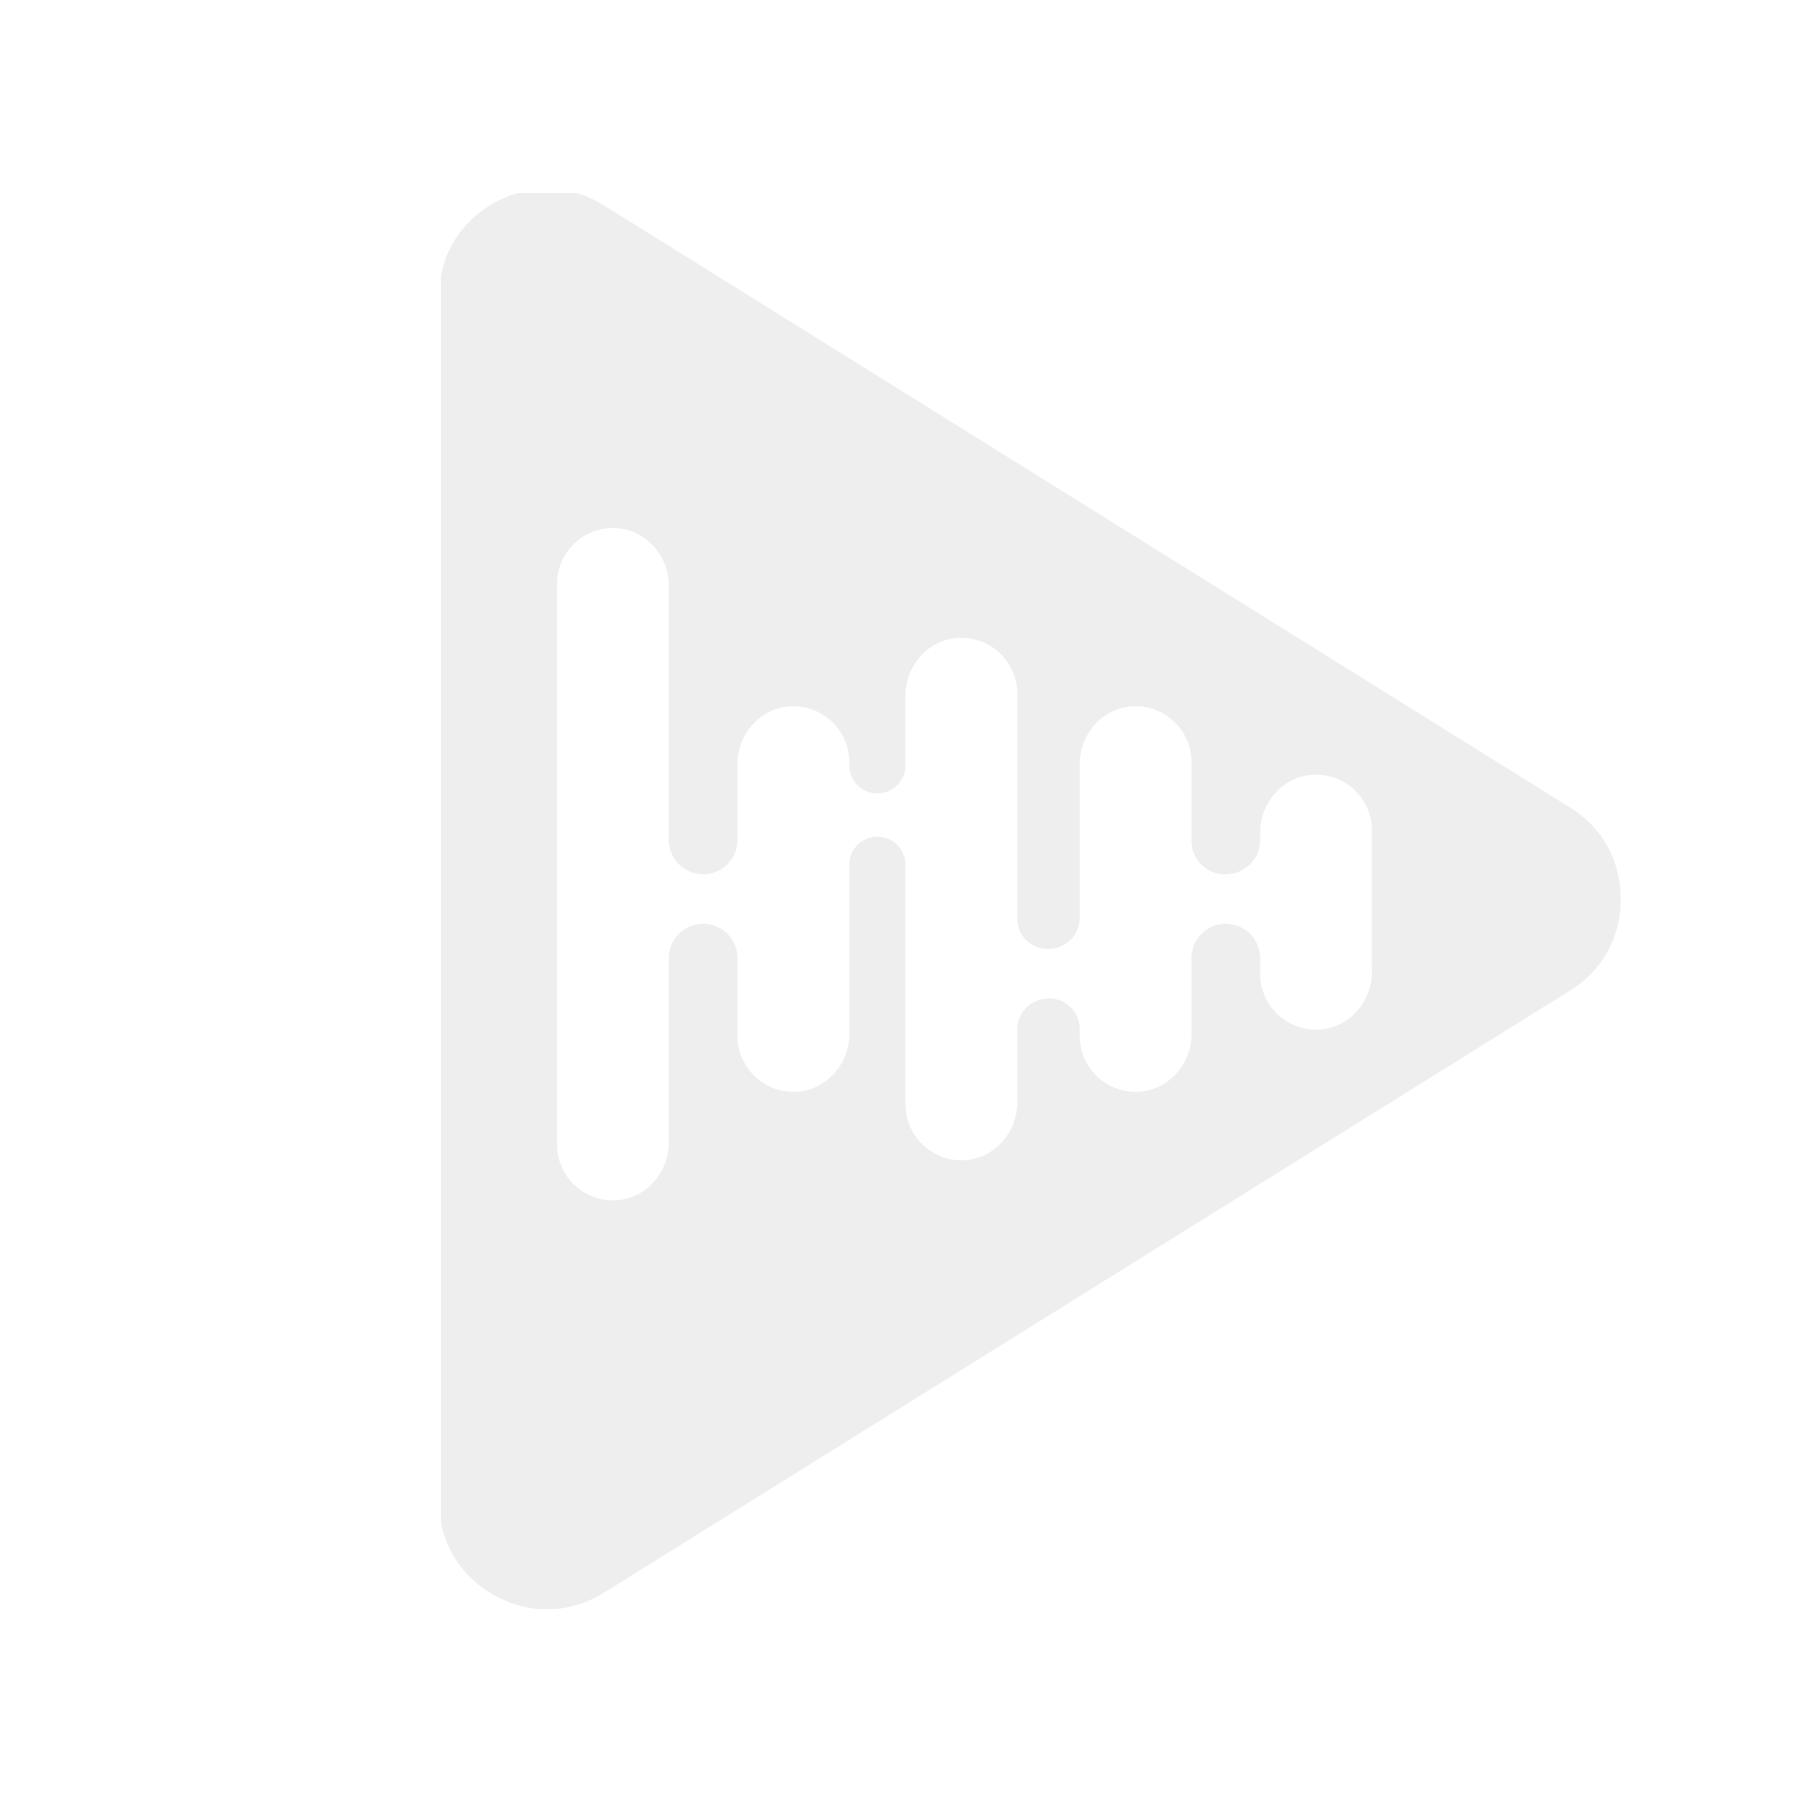 Skoddejuice Melon Cantaloupe Aroma